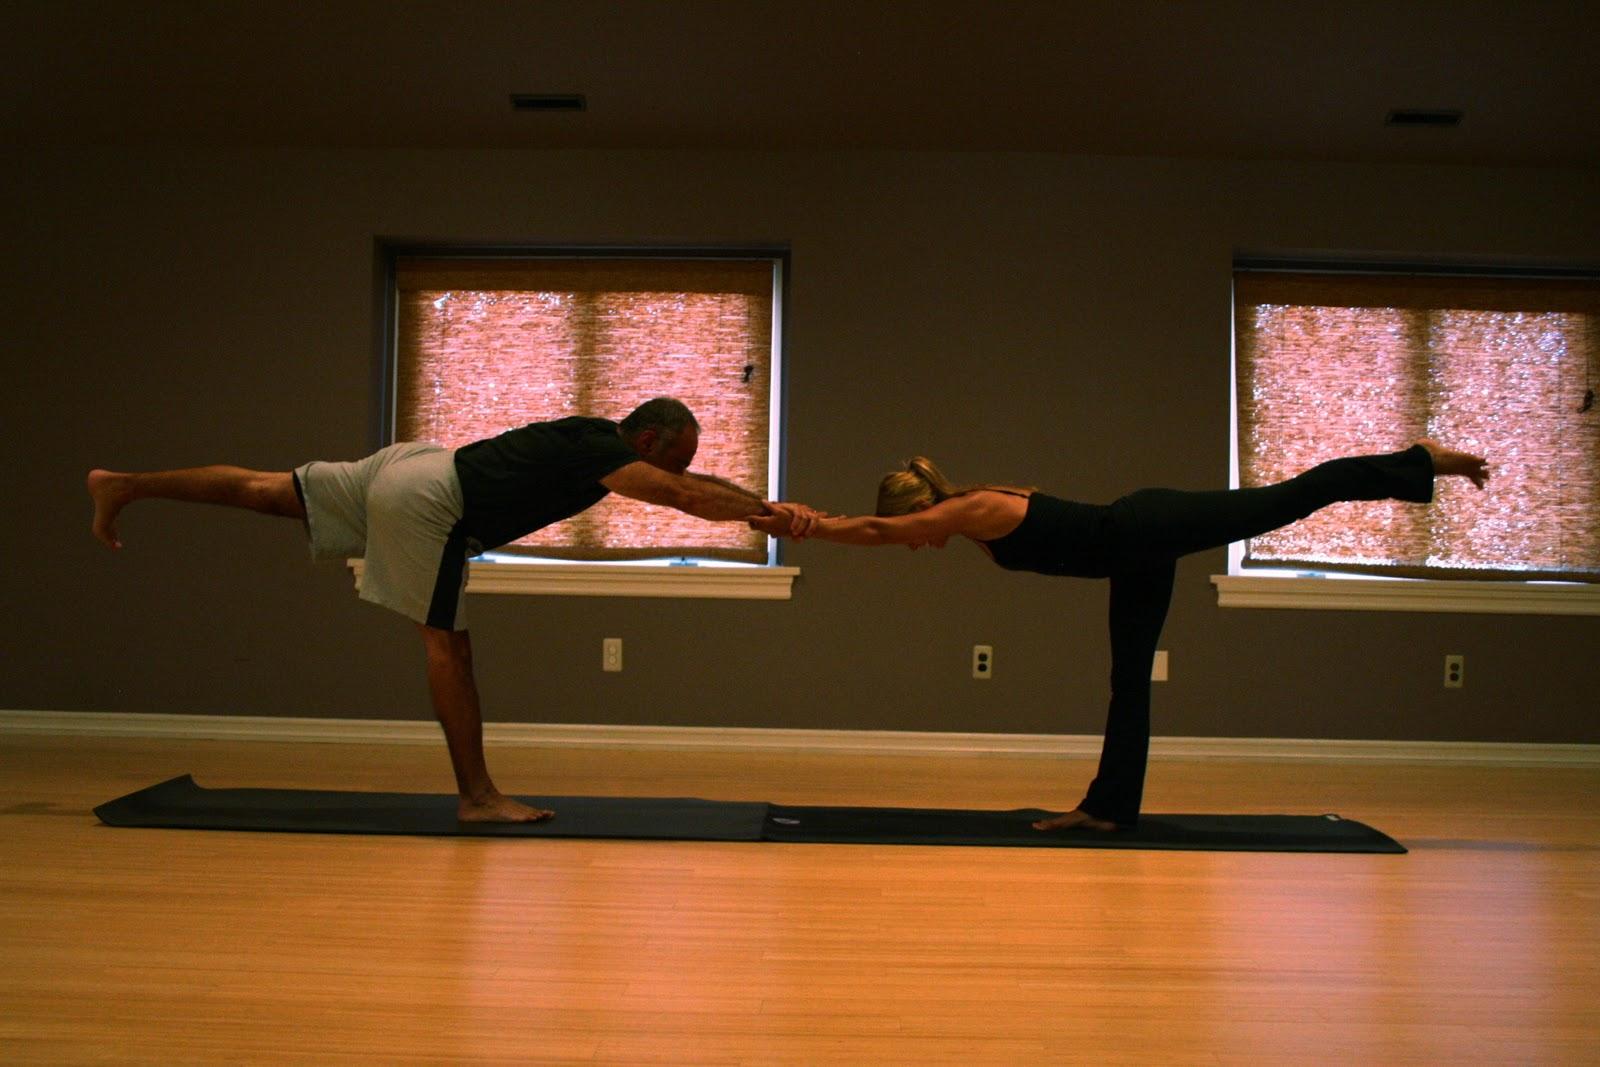 Aurorae Yoga: Aurorae's 12 Yoga Poses of Christmas - Day 7